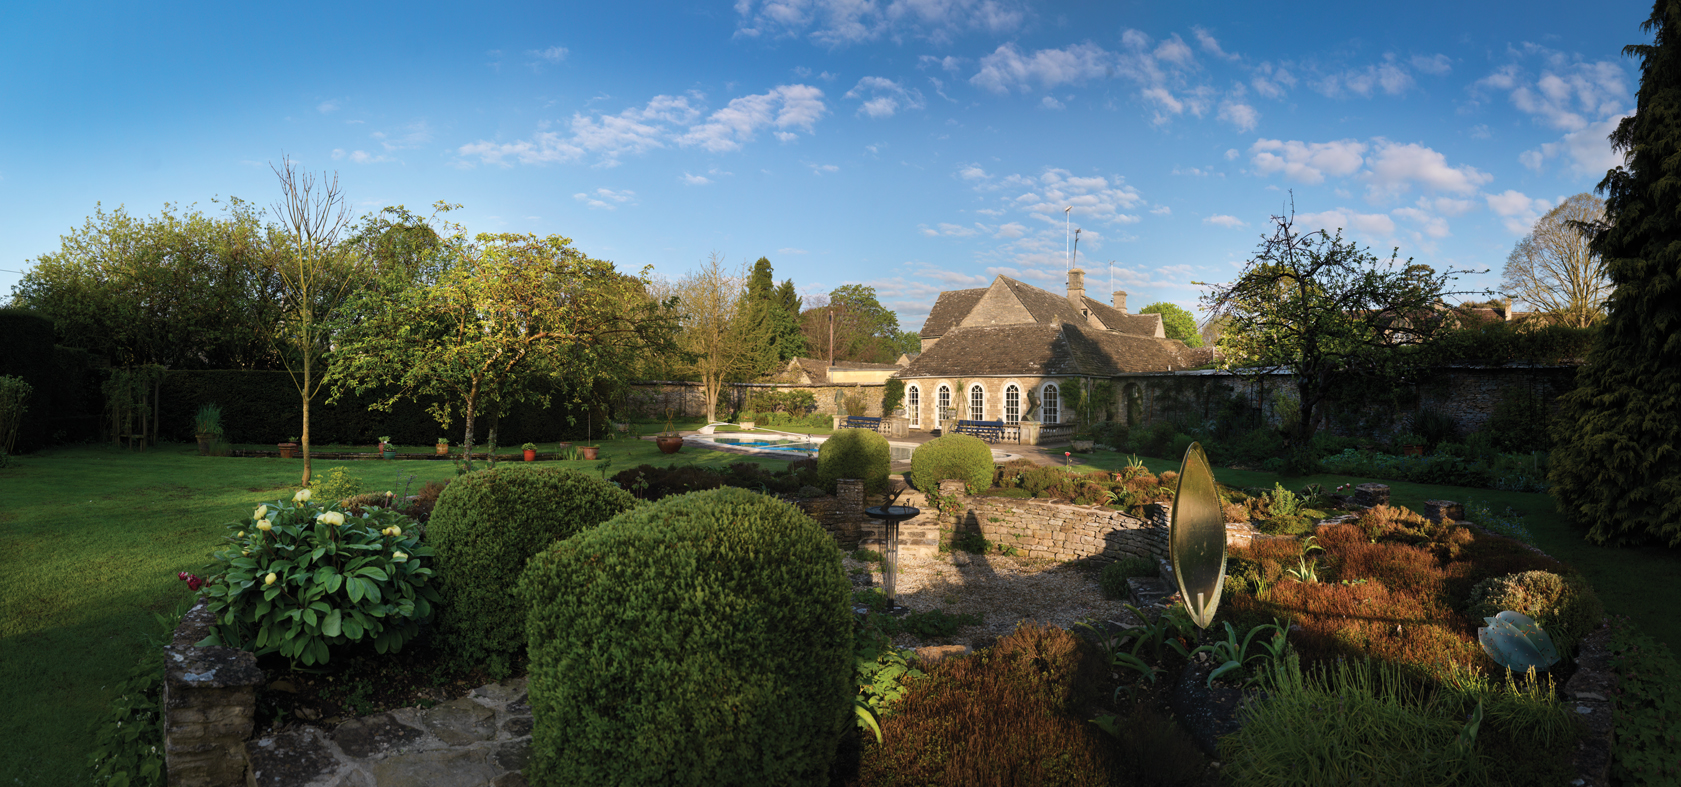 Pool House panorama copy